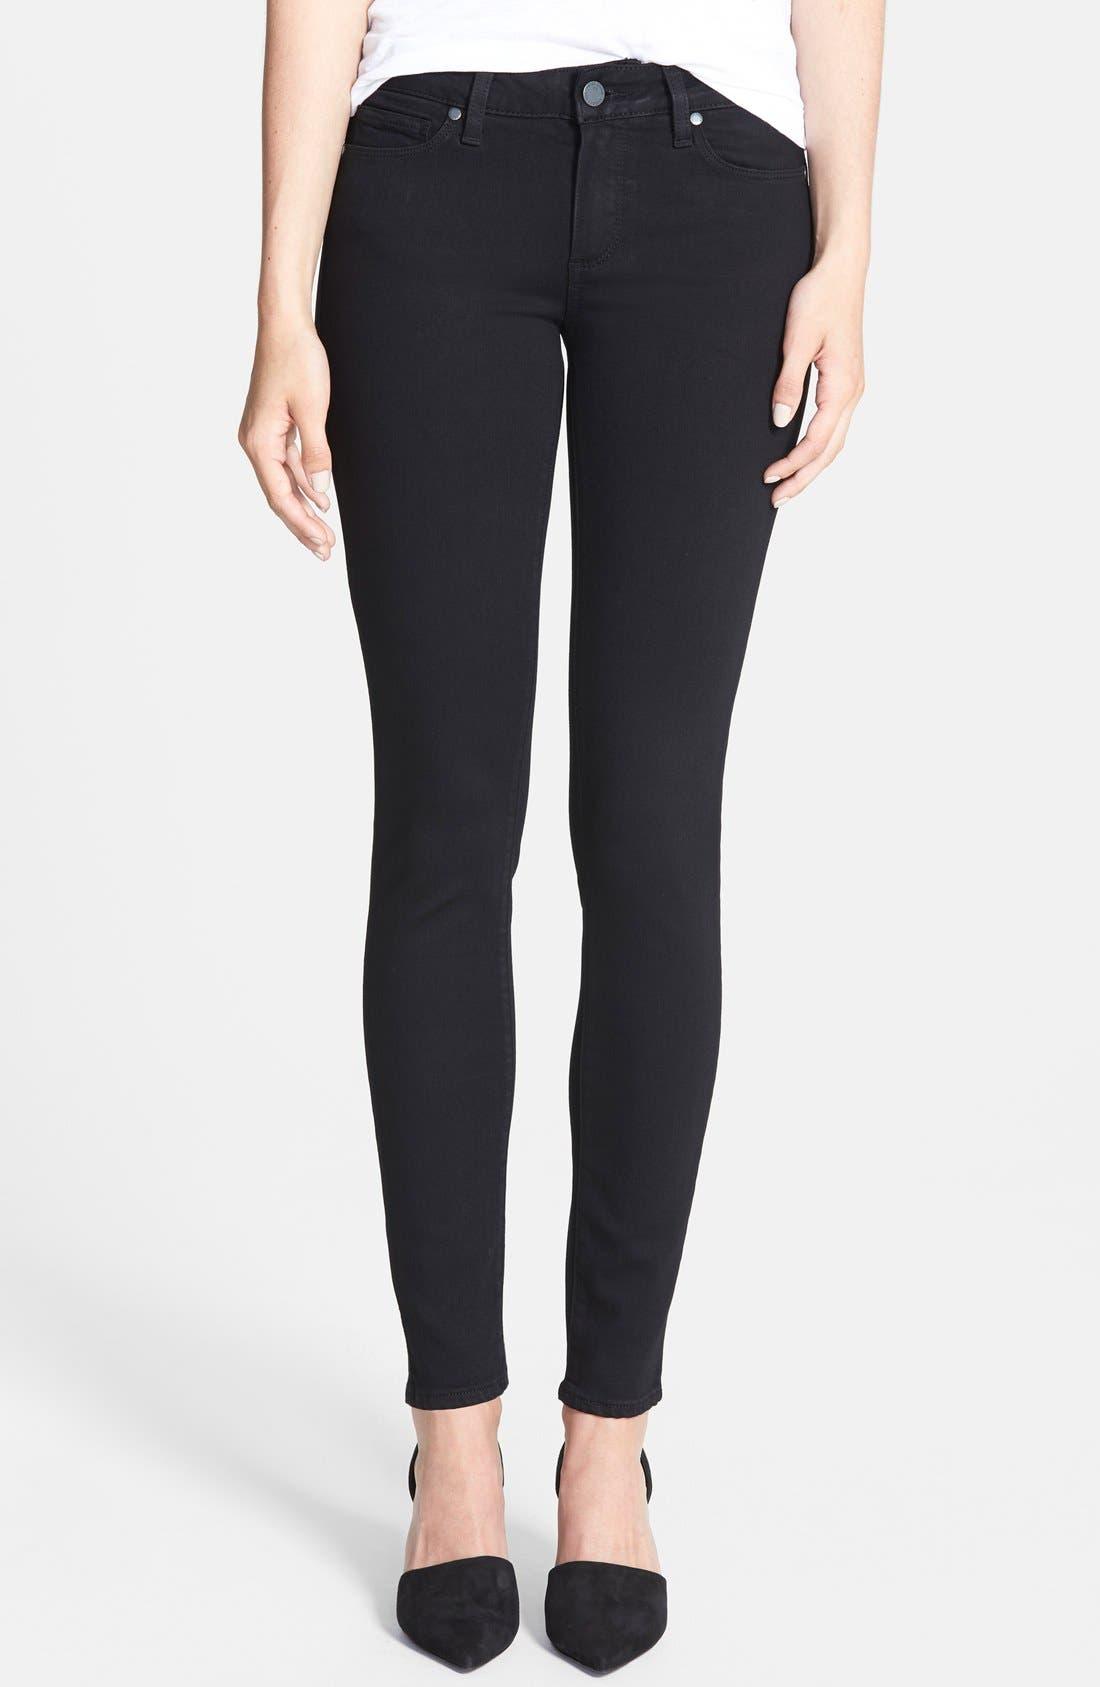 Transcend - Verdugo Ultra Skinny Jeans,                         Main,                         color, Black Shadow